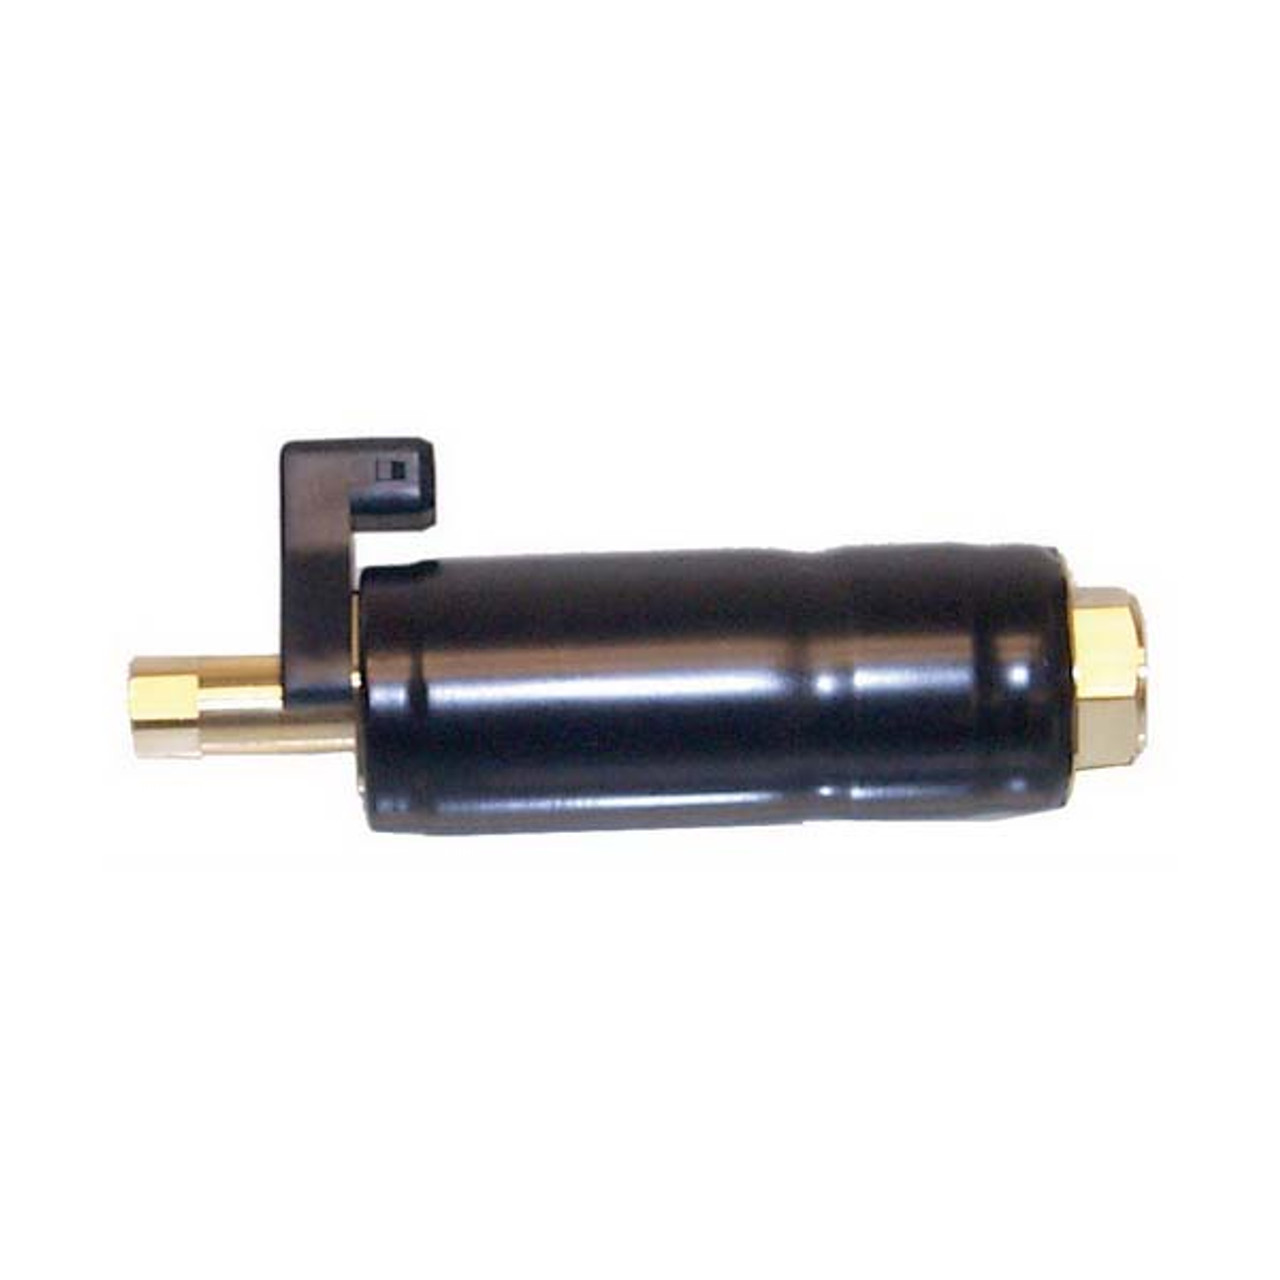 ELECTRIC FUEL PUMP for Volvo Penta OMC 3858261 3850809 3857986 Engine 3854620